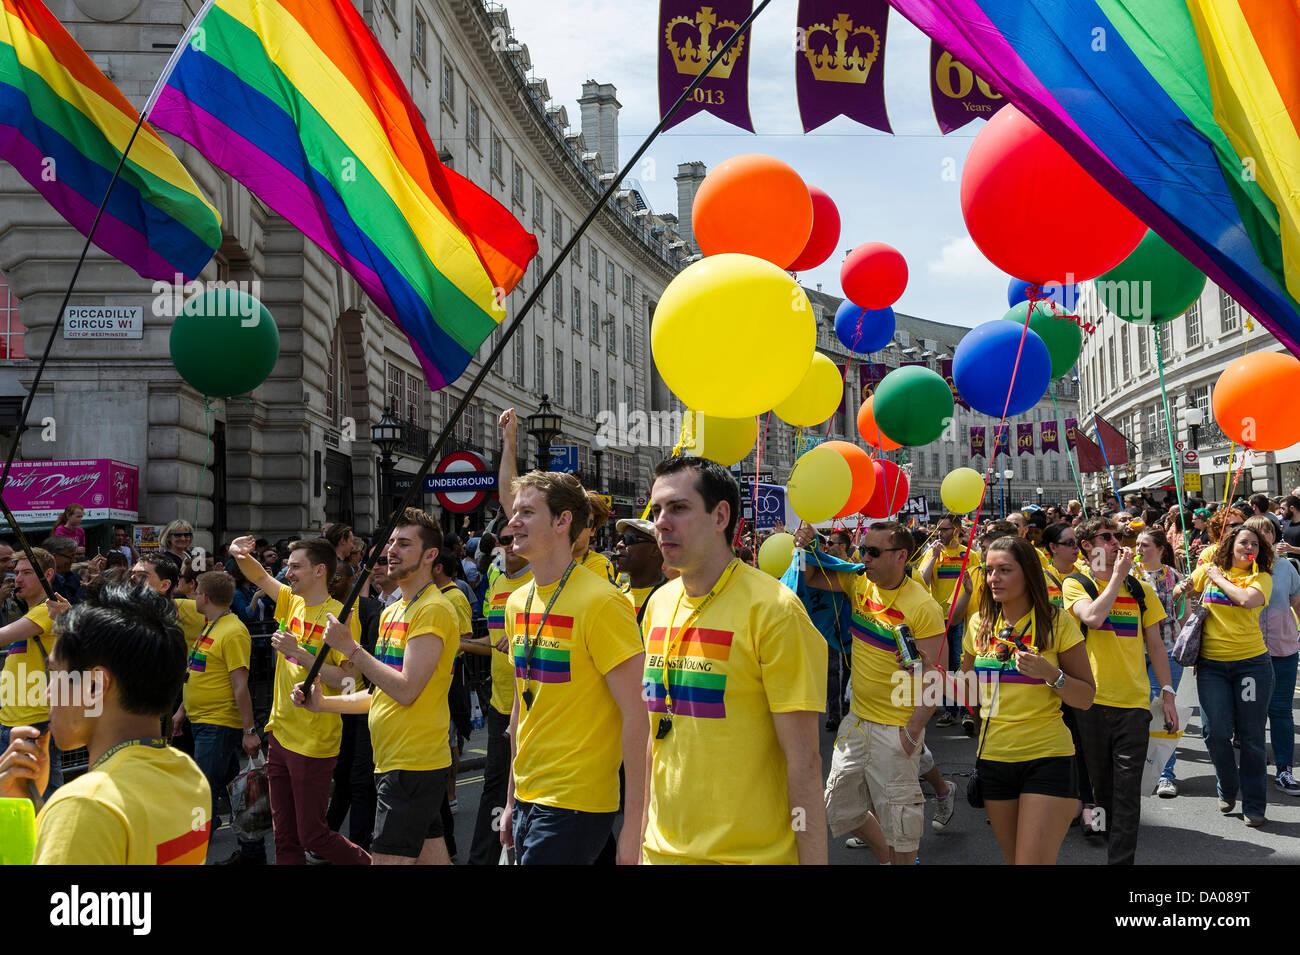 London, UK. 29th June 2013.  Participants in the London Pride parade on Regent's Street.  Photographer:  Gordon - Stock Image